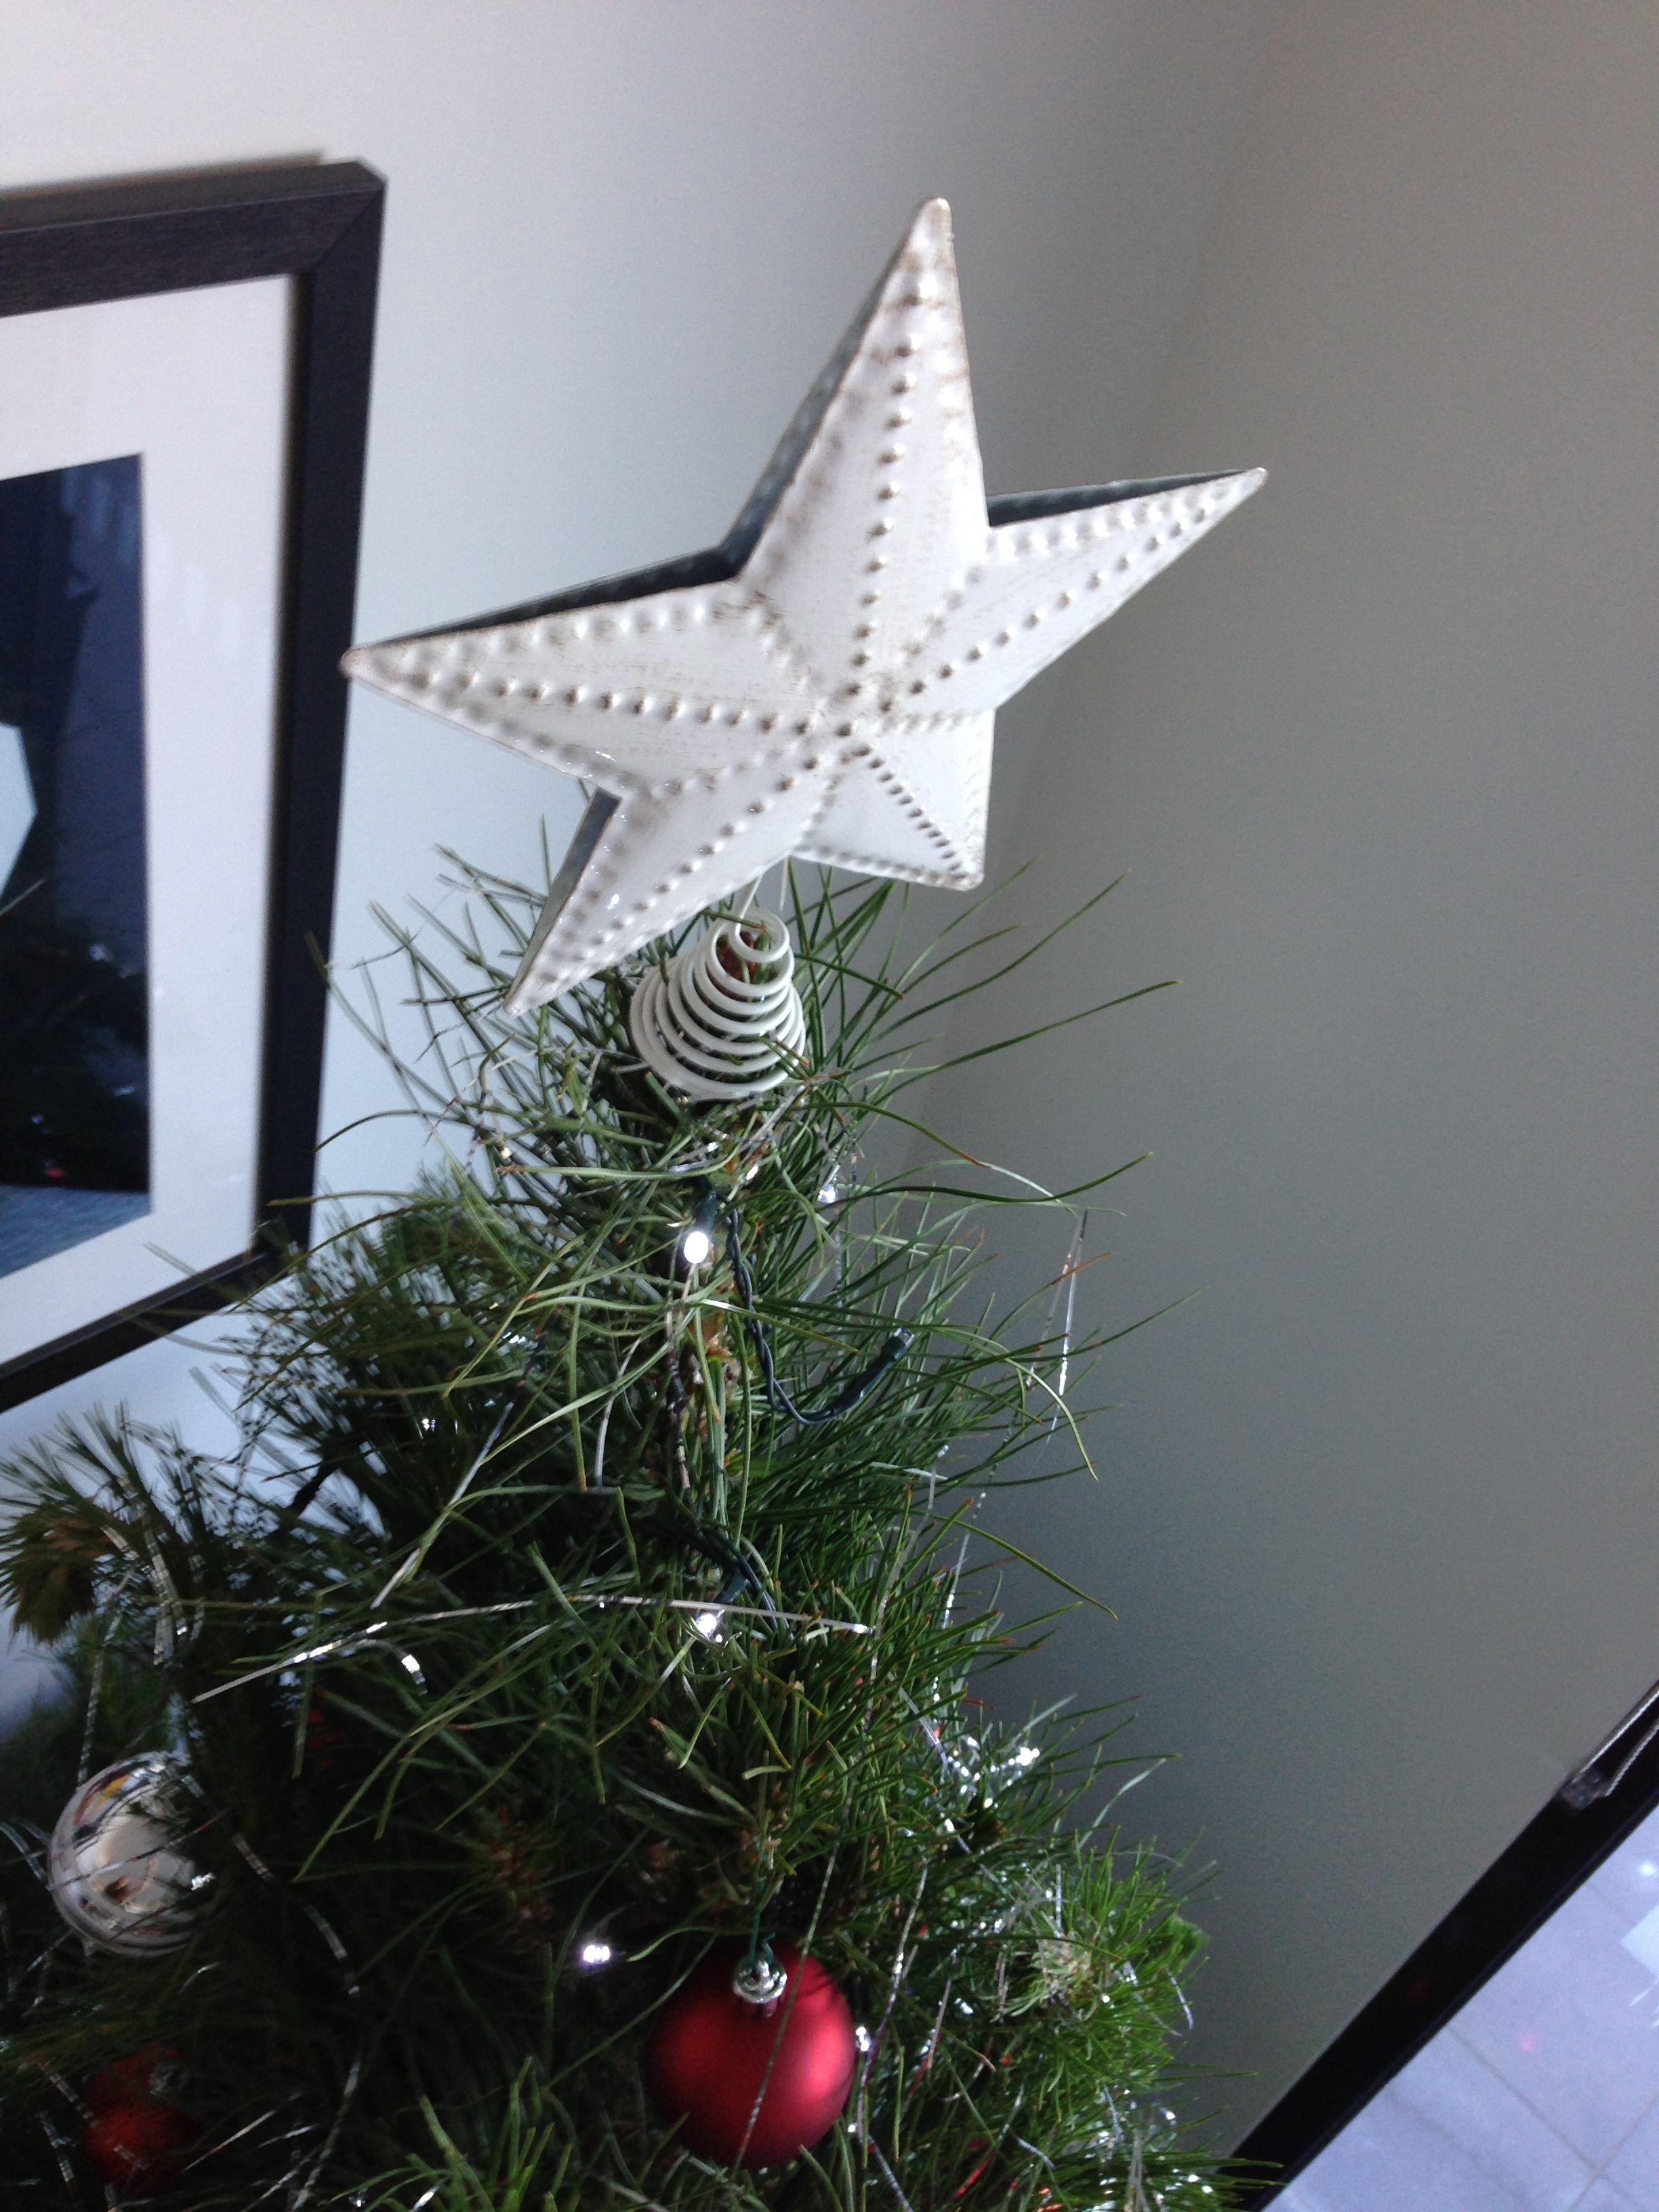 Christmas Home Star Available At Myer Christmas Home Holiday Decor Christmas Ornaments